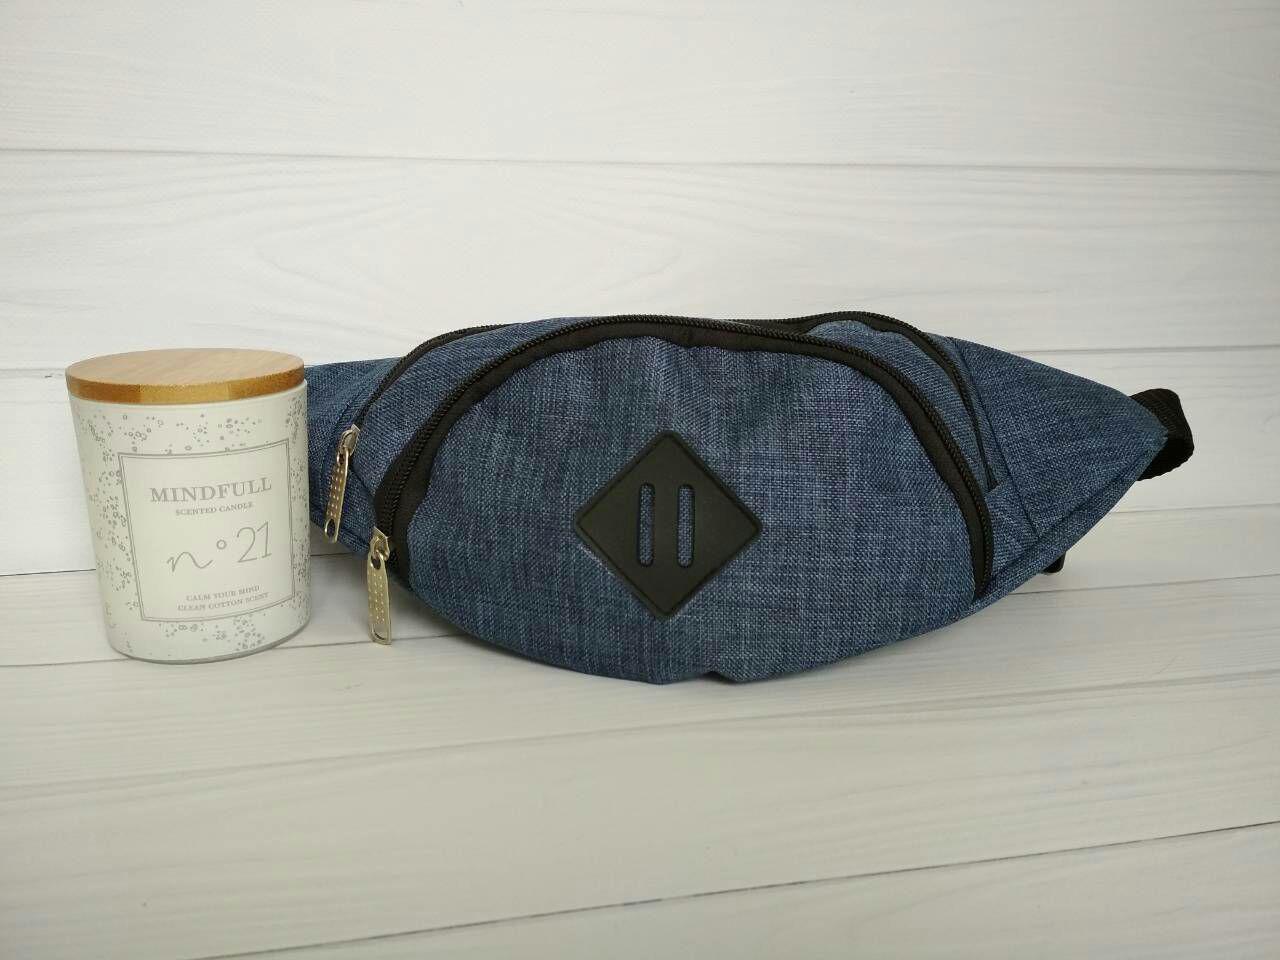 Повседневная сумка бананка из текстиля синего цвета